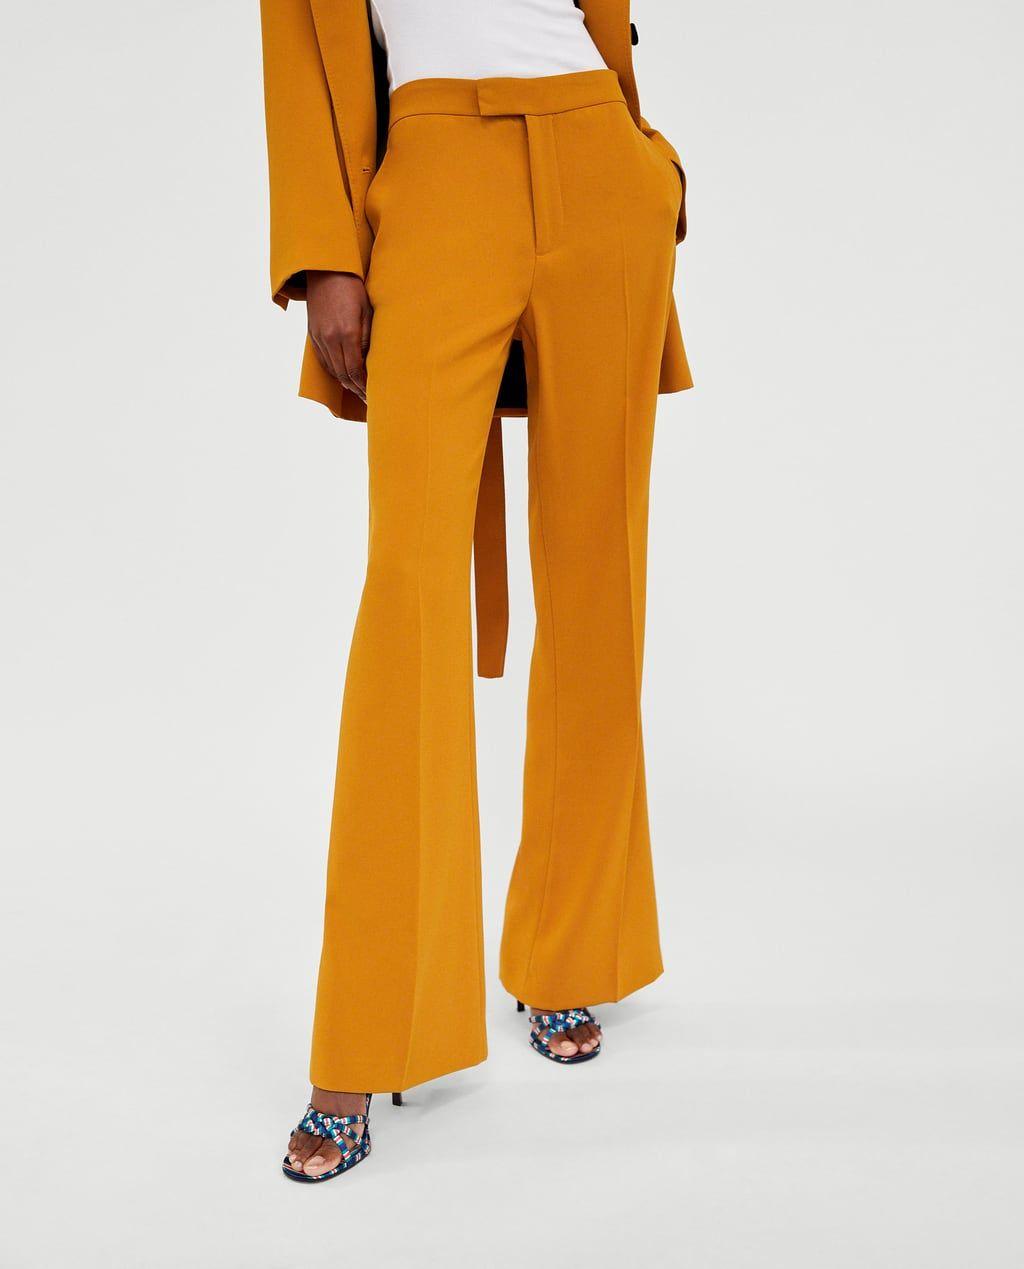 Pantalon Flare Pantalones De Vestir Pantalones Mujer Zara Espana Suits For Women Trousers Trousers Women